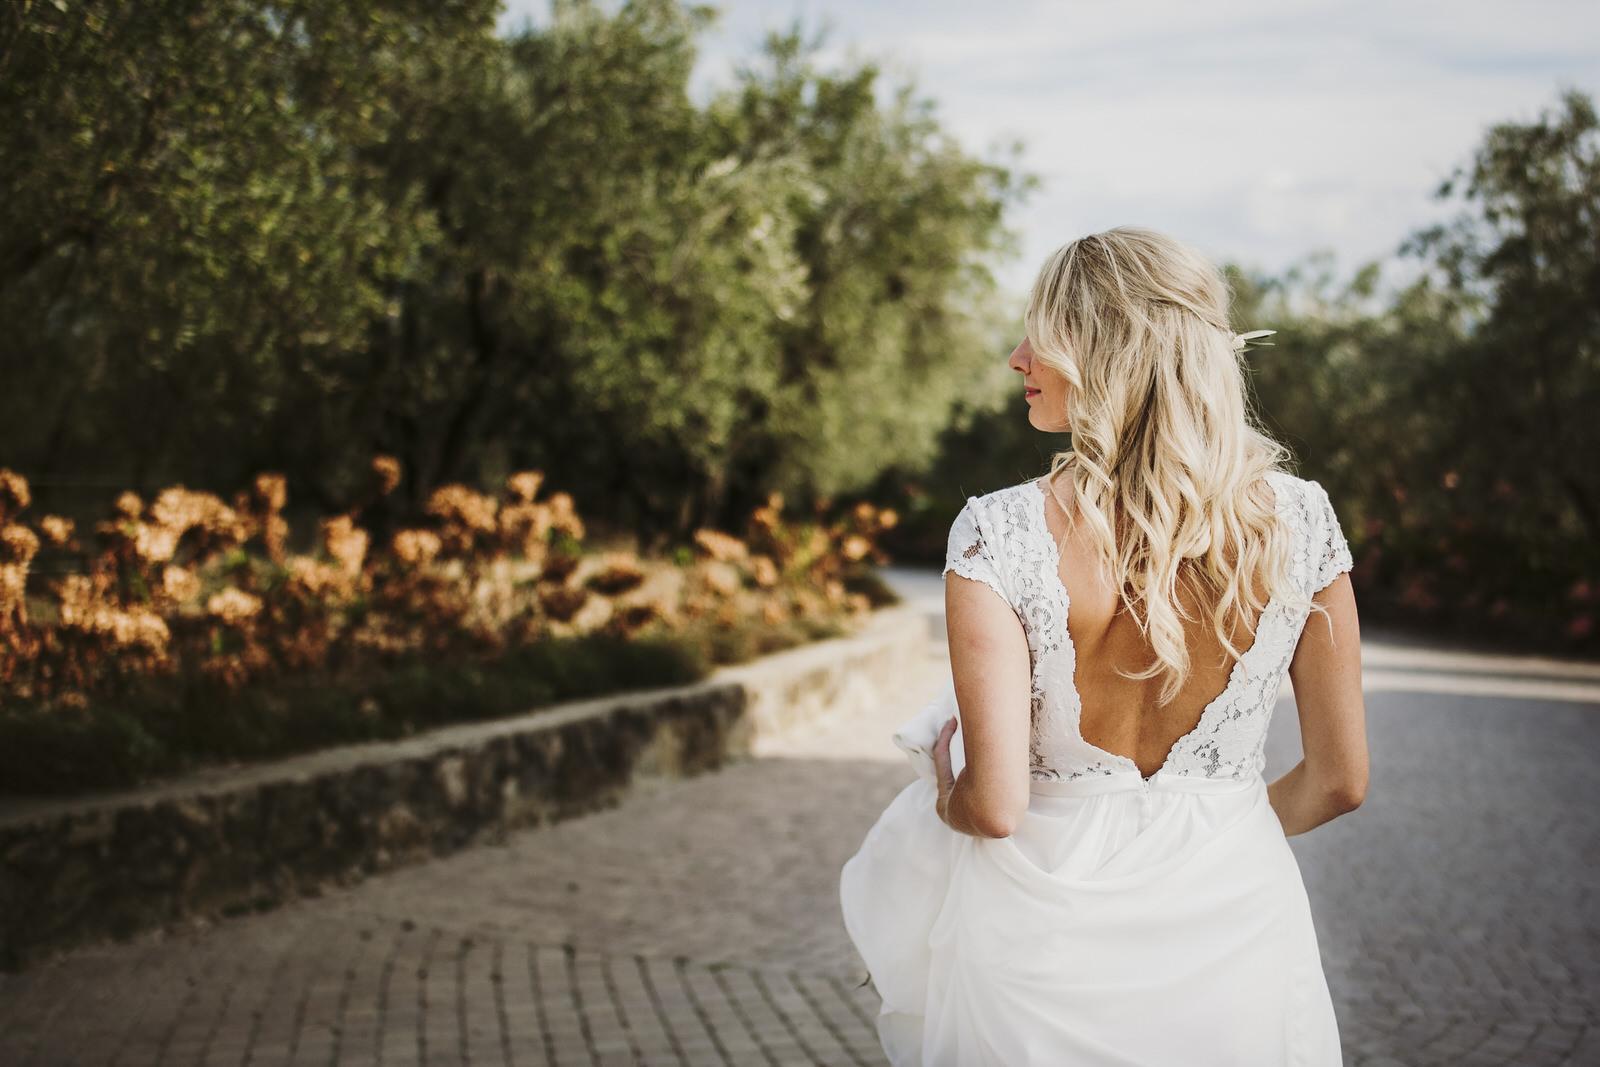 wedding photographer in italy-venice-tuscany-florence-amalfi coast-como lake-villa del balbianello-siena-amalfi-ravello-belmond-villa cimbrone72